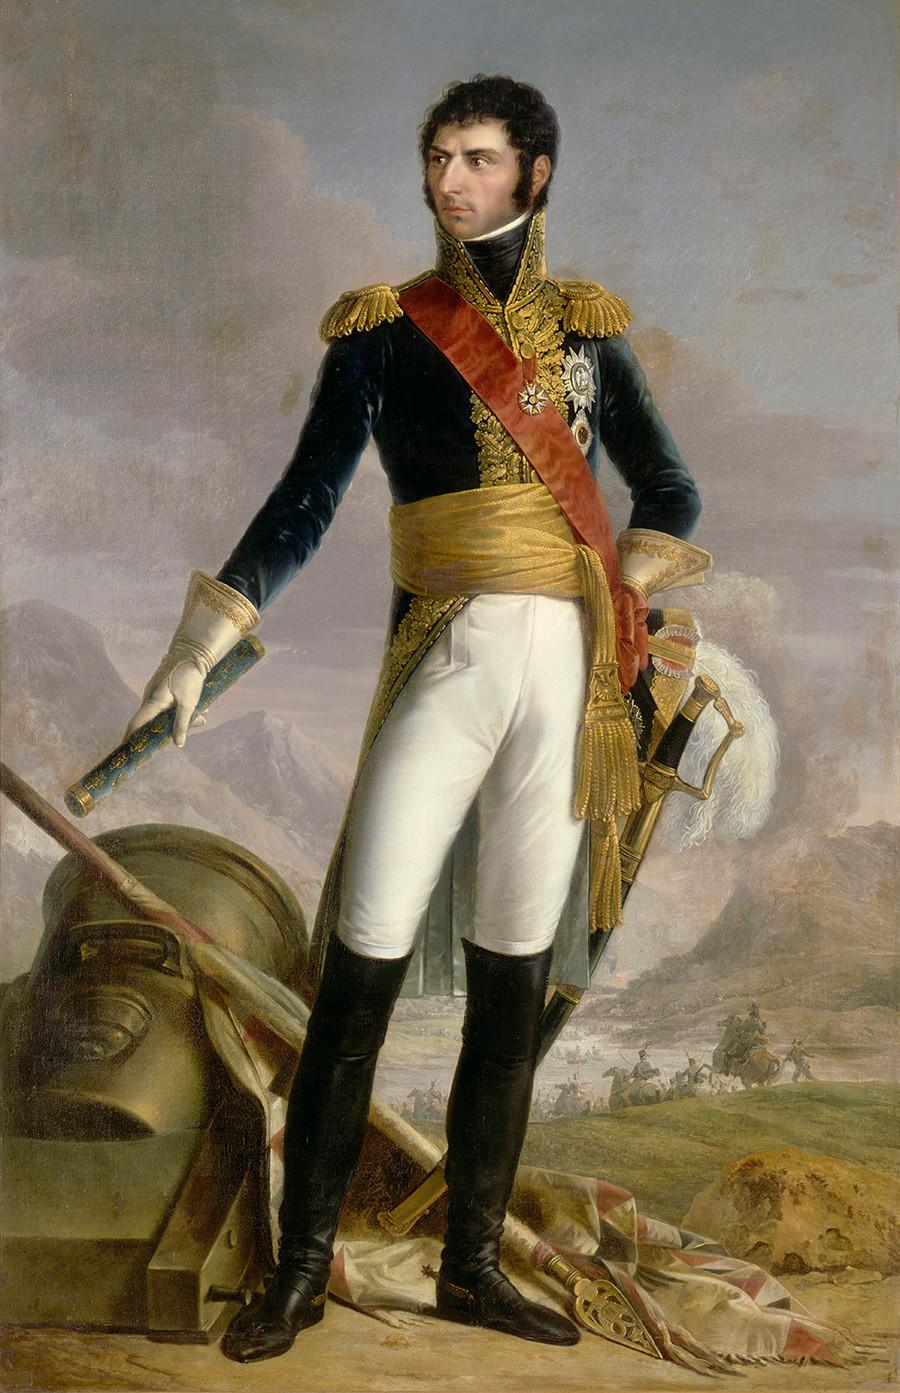 Жан Батист Бернадот, Карл XIV Јуан Шведски и Карл III Јохан Норвешки, маршал француски, 1818. према слици Франсоа Кинсона.